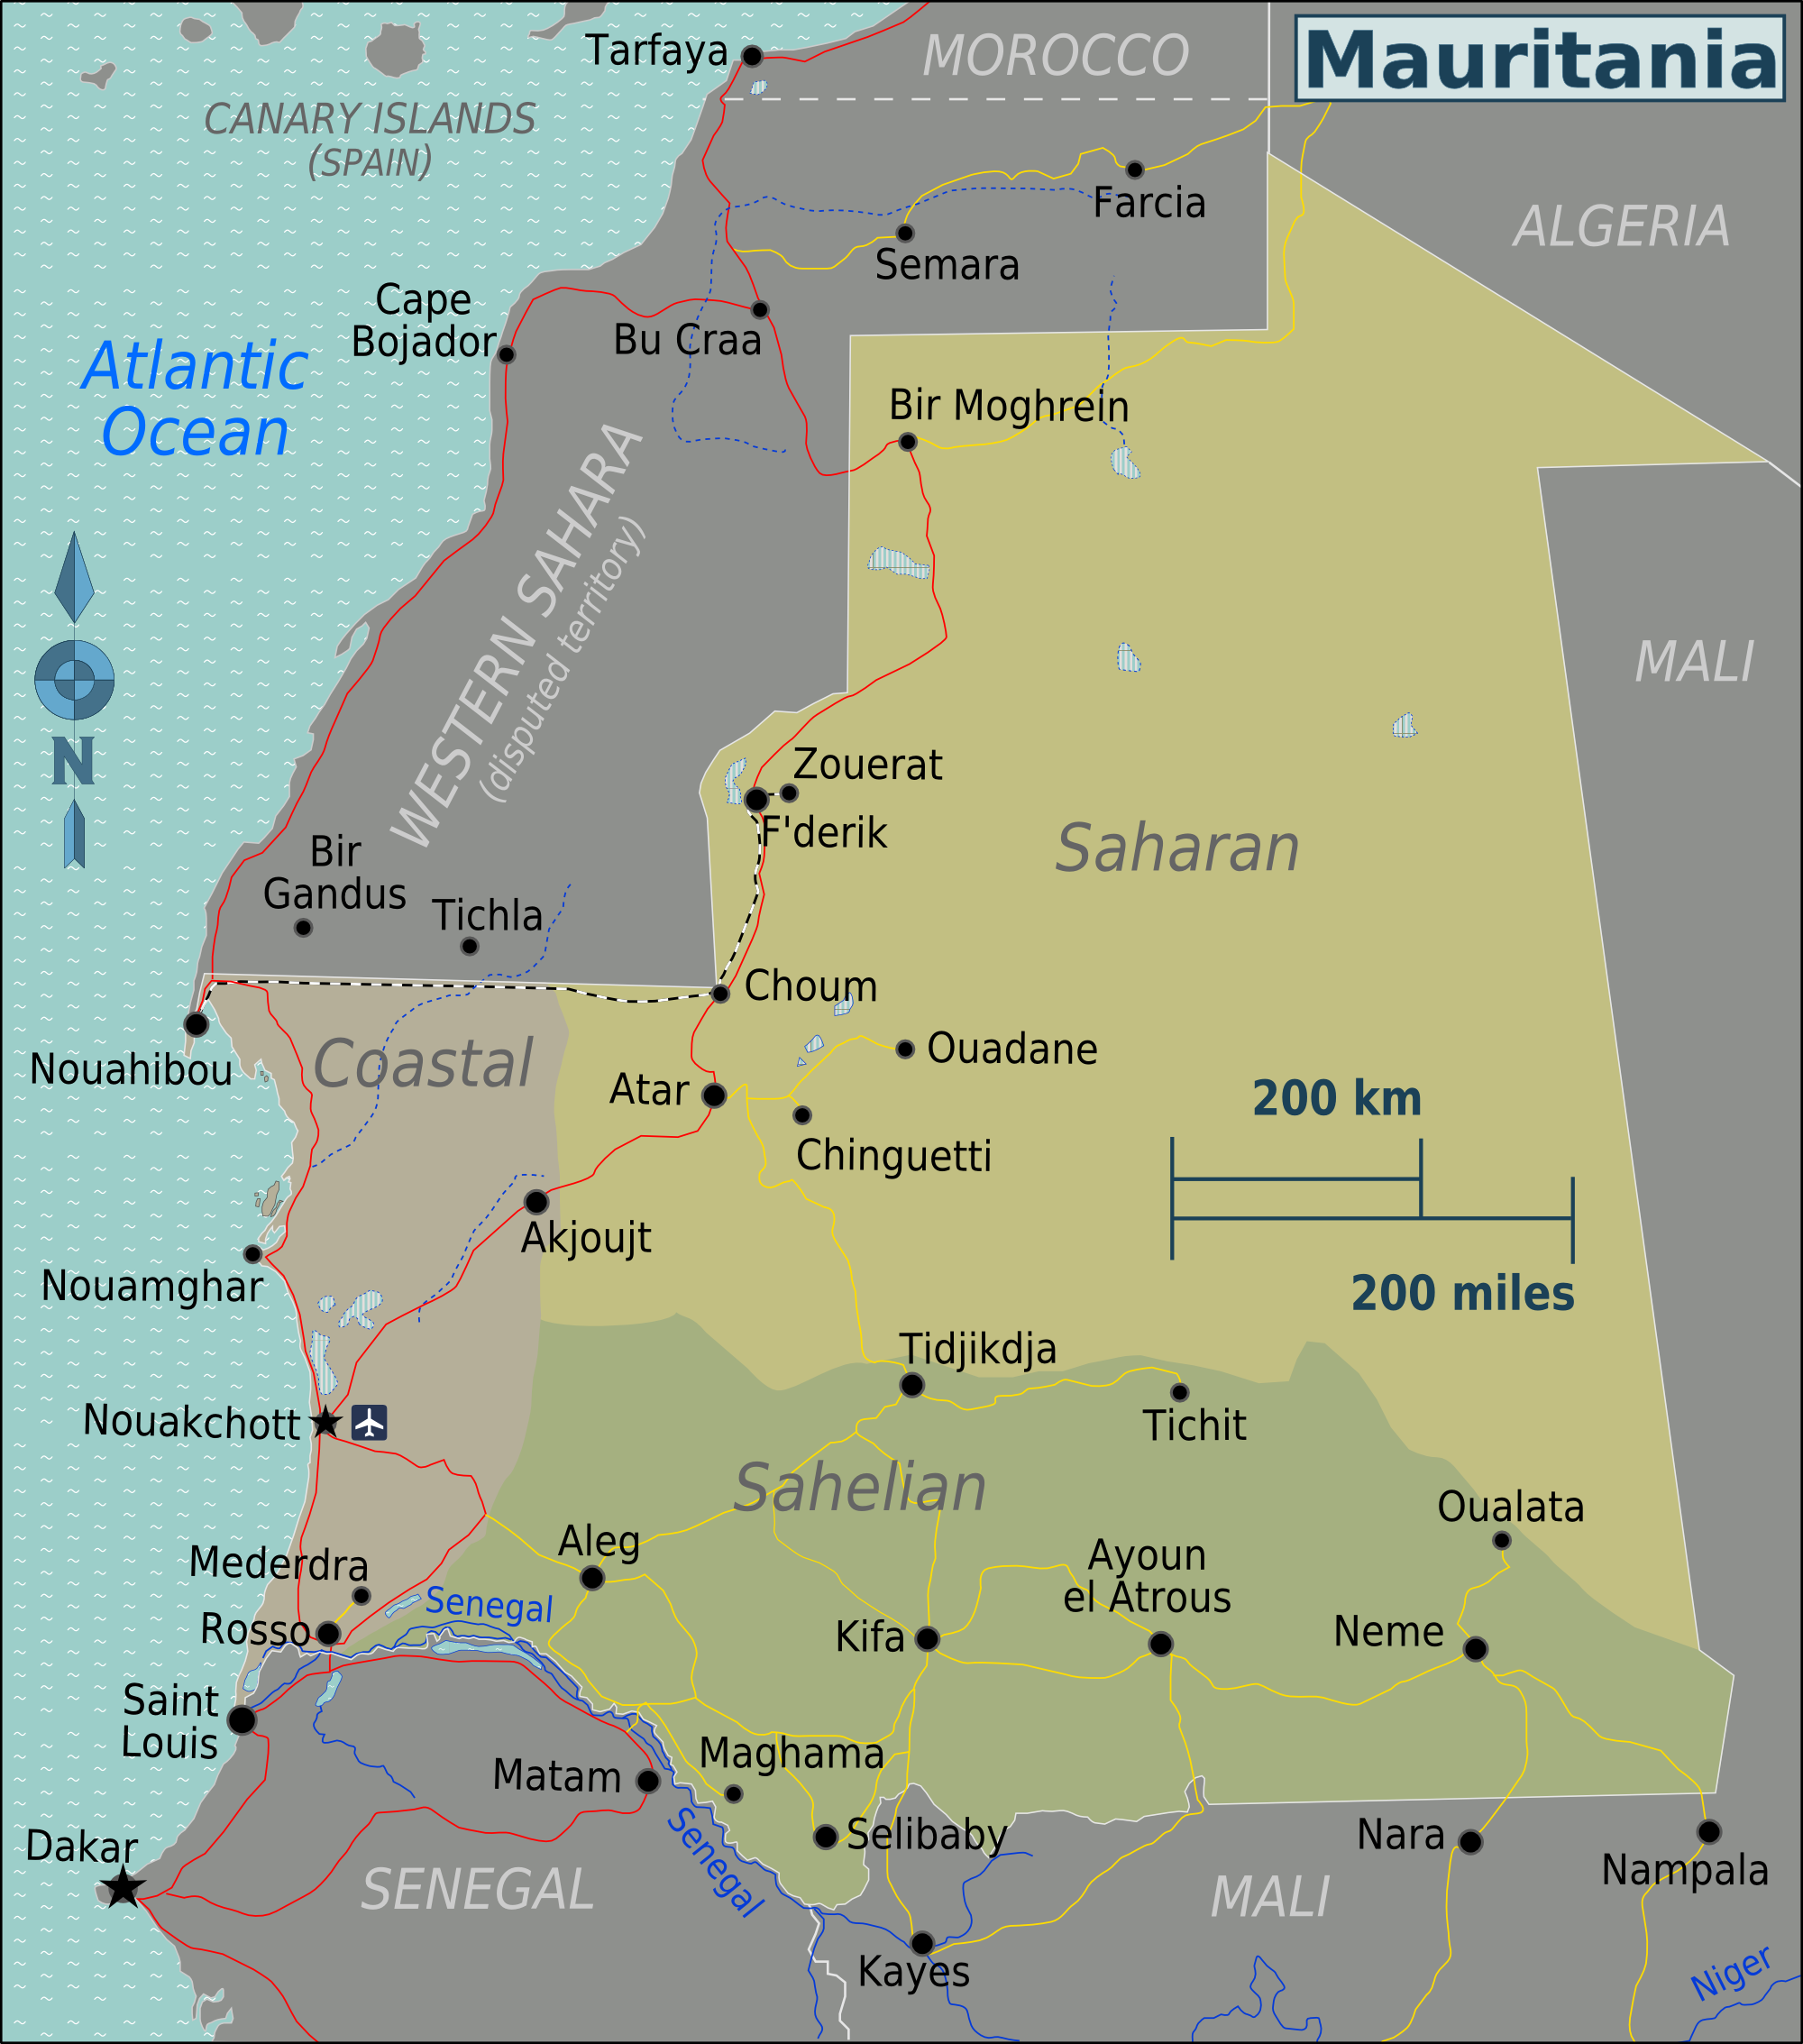 Mauritania travel guide